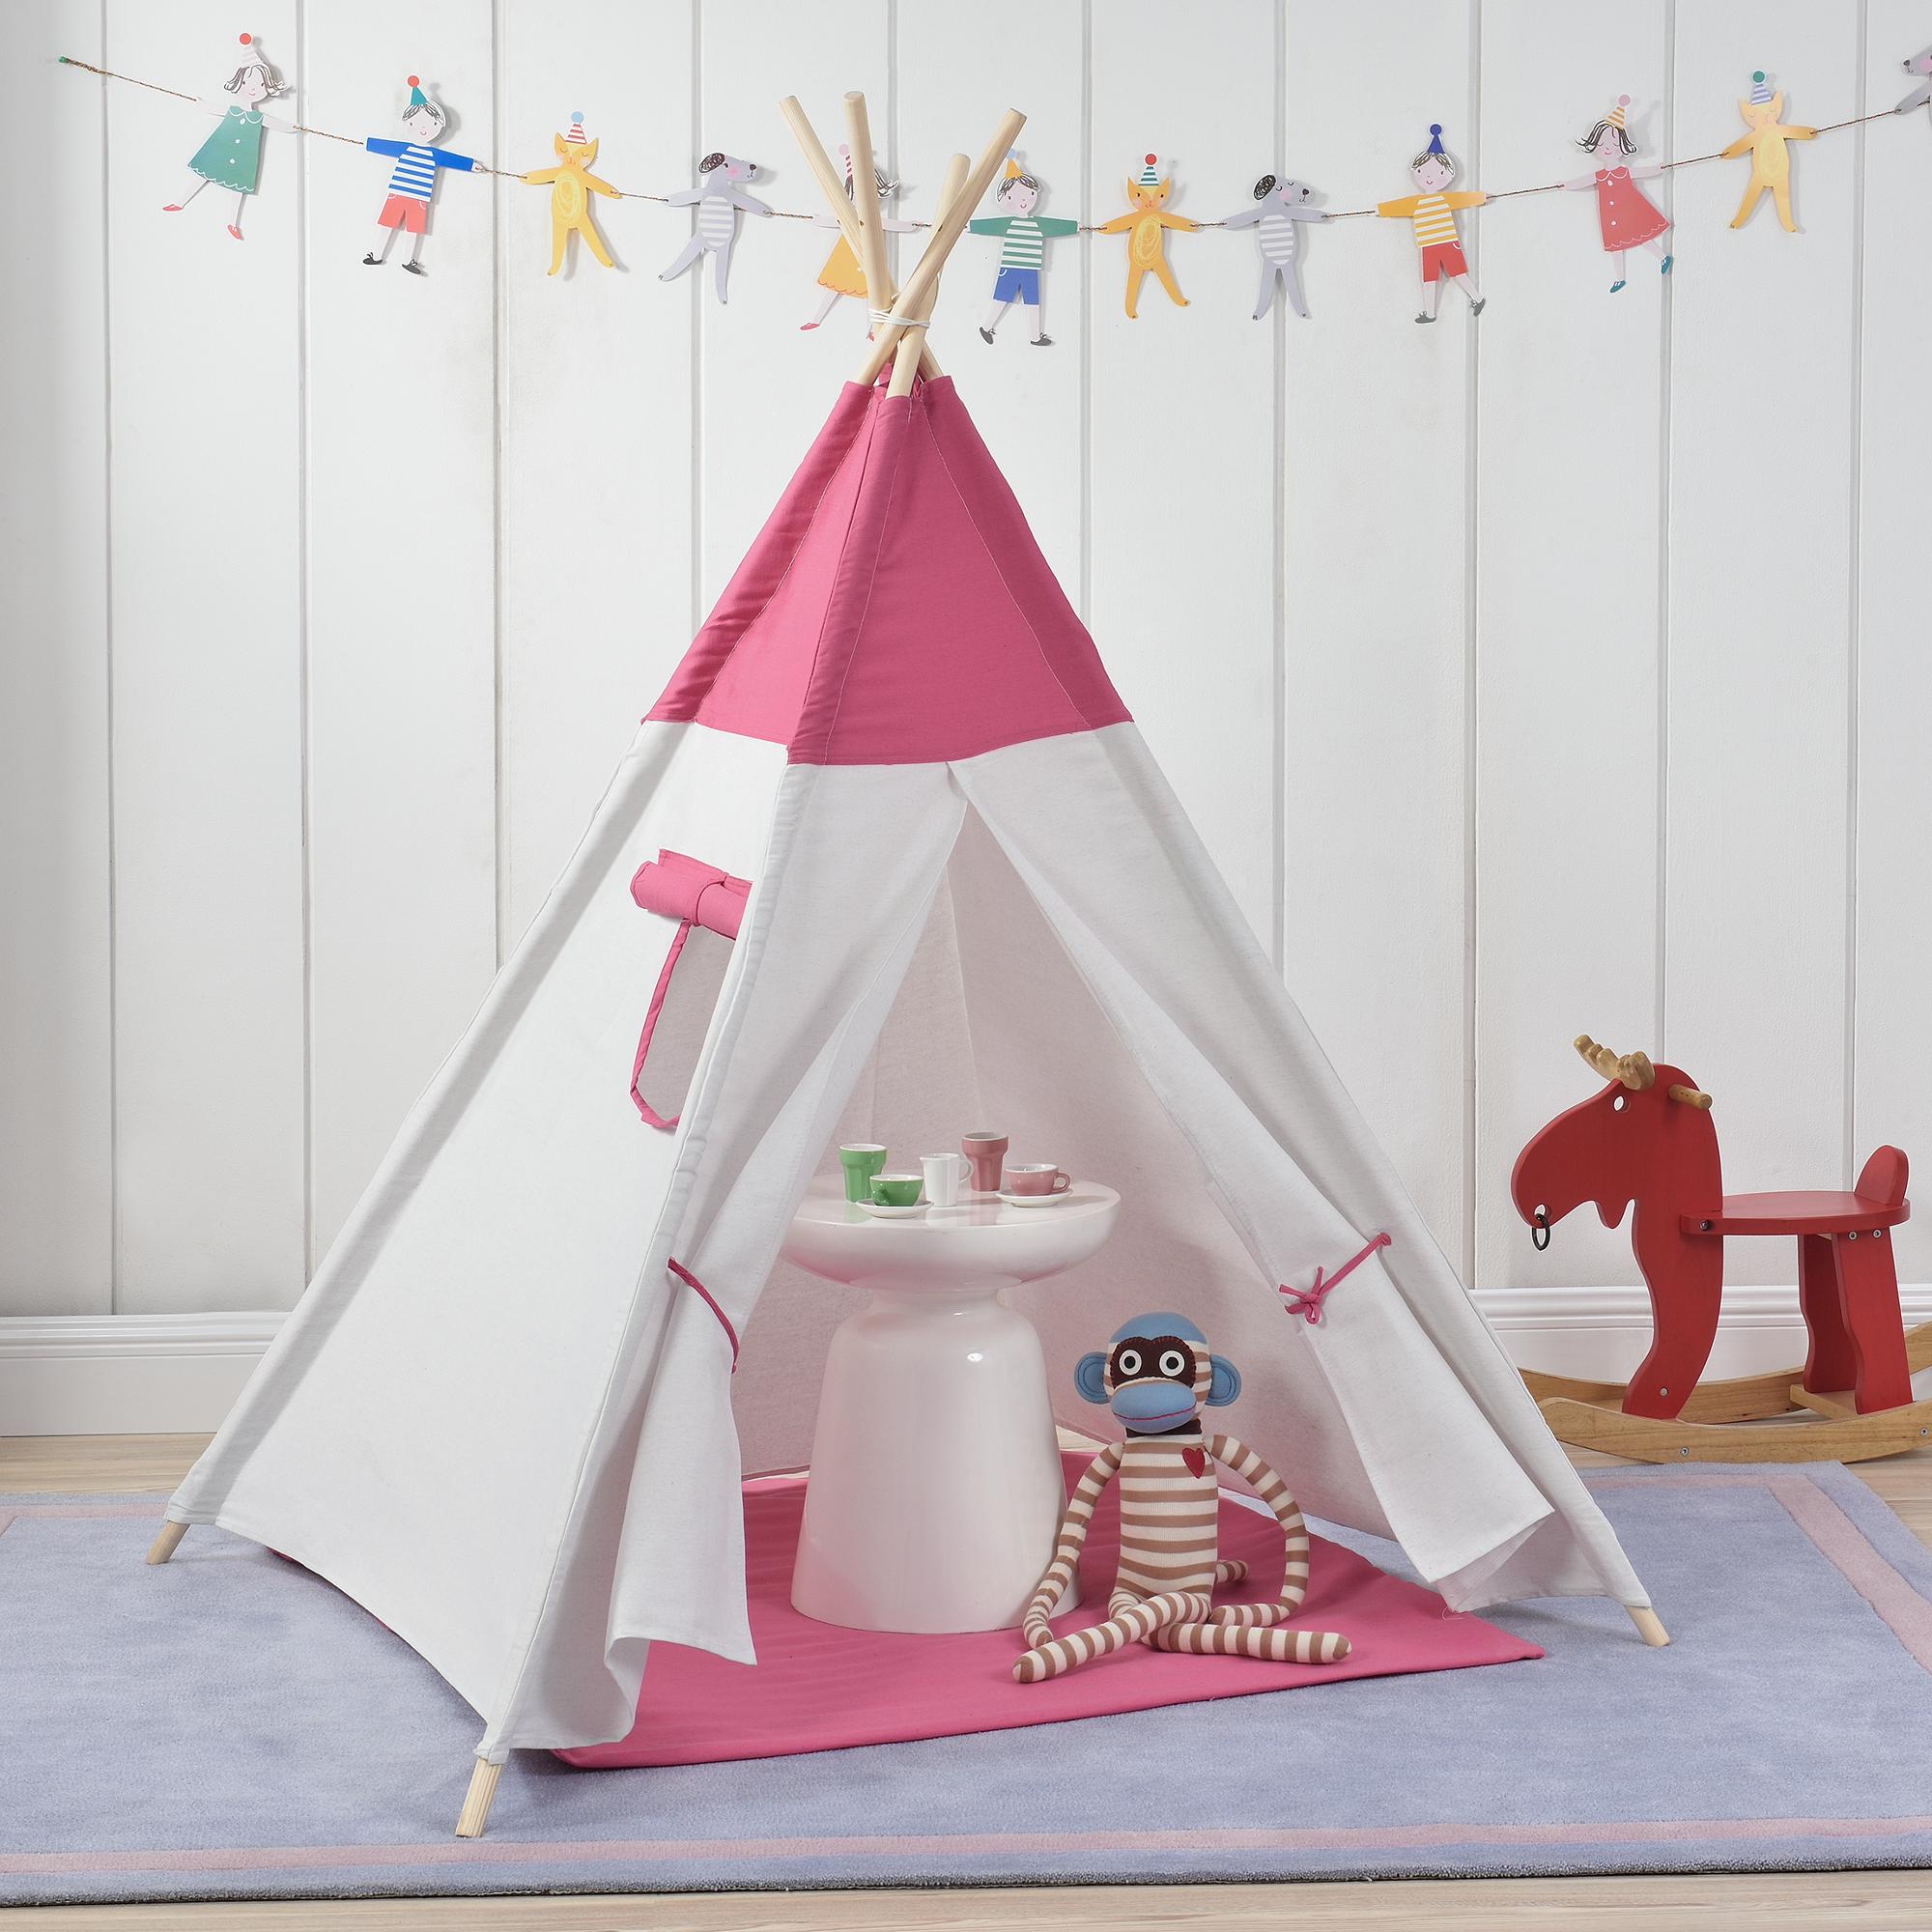 en.casa]® Kinderzelt Spielzelt Babyzelt Spielhaus Kinder Tipi ...